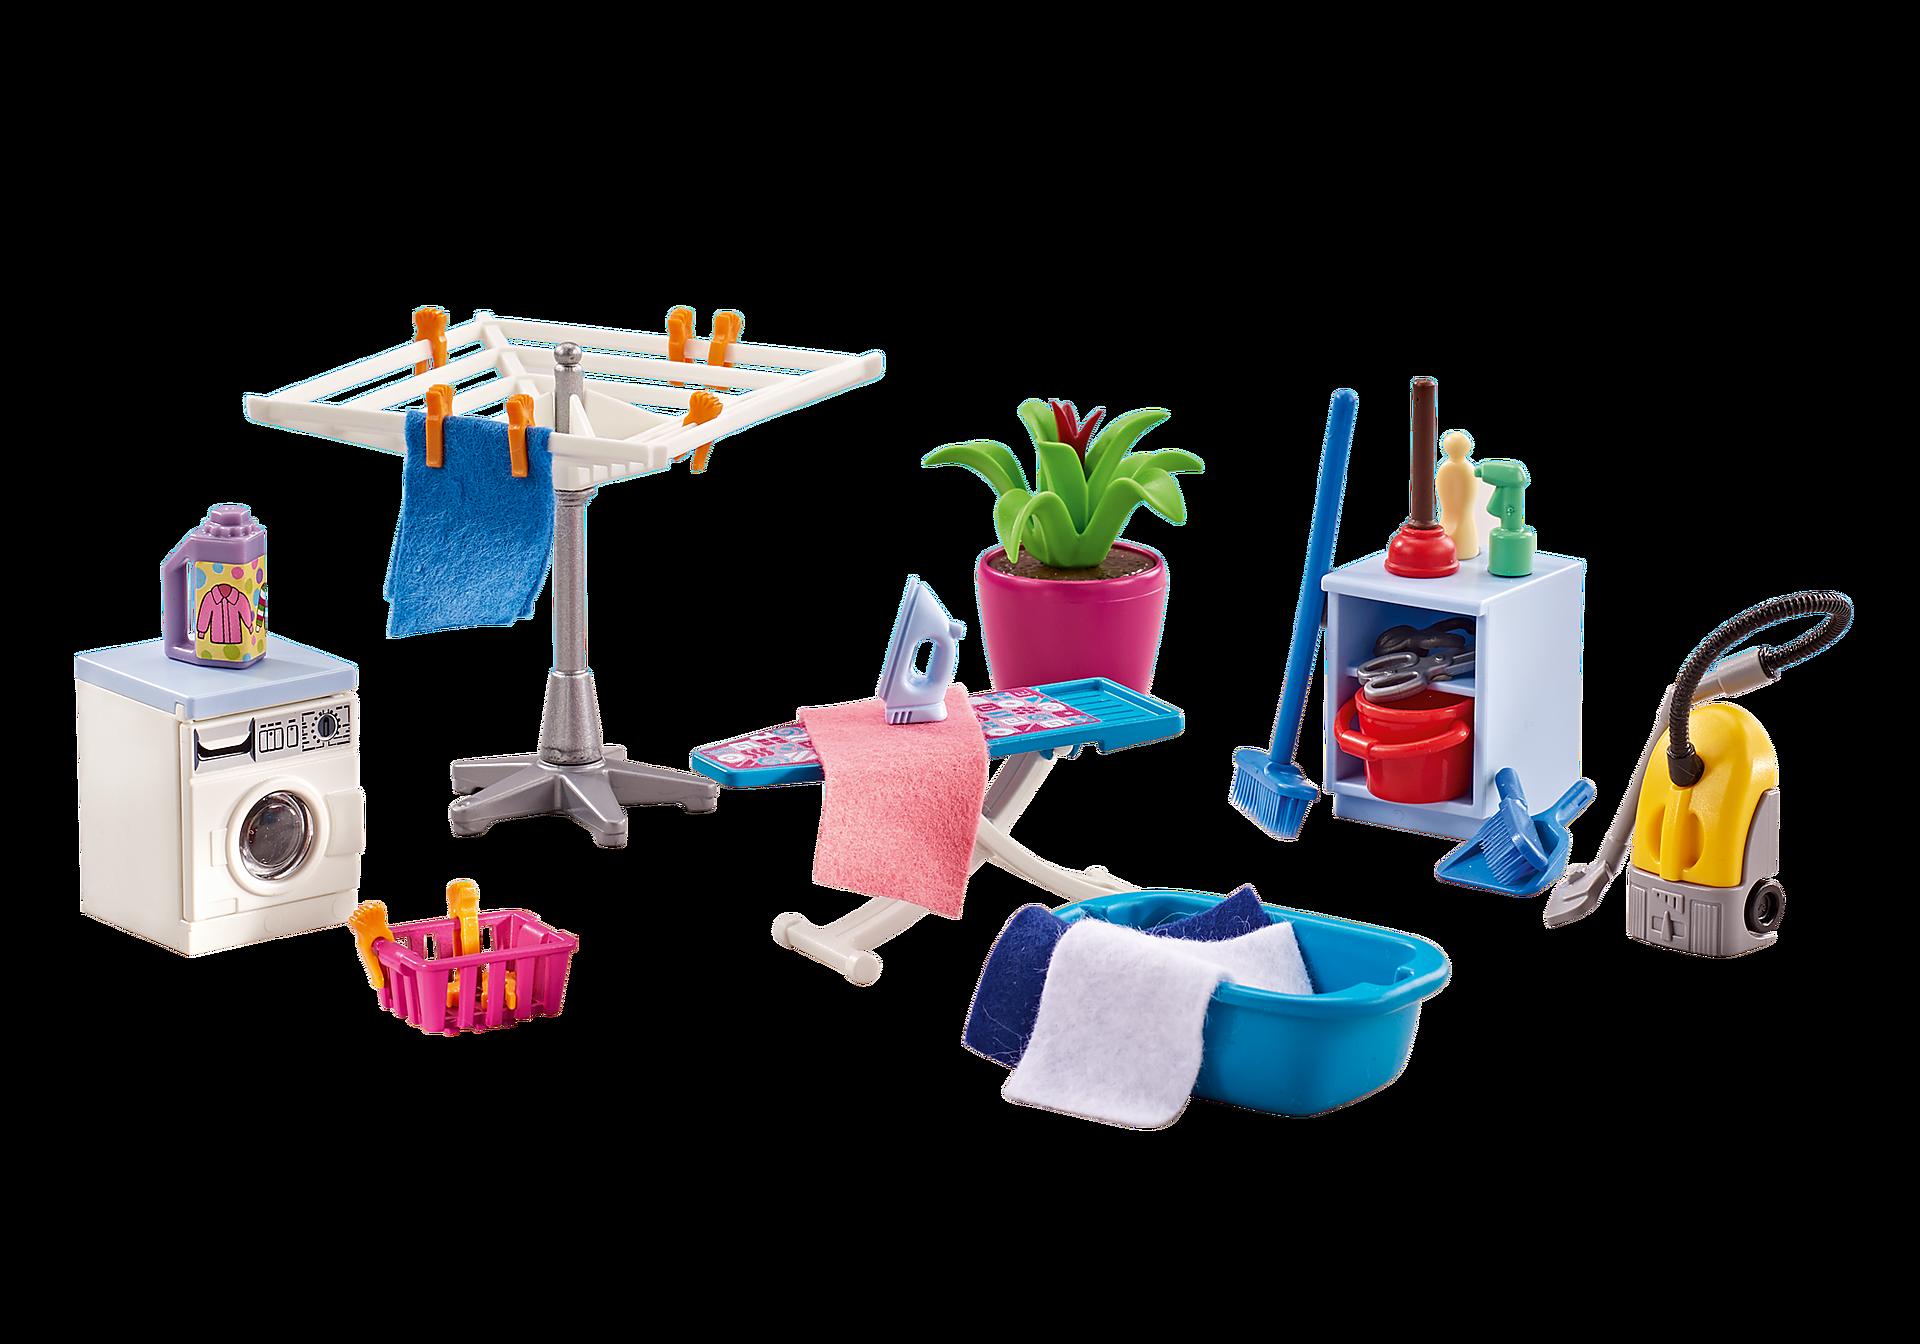 http://media.playmobil.com/i/playmobil/6557_product_detail/Lavandaria e Arrumos